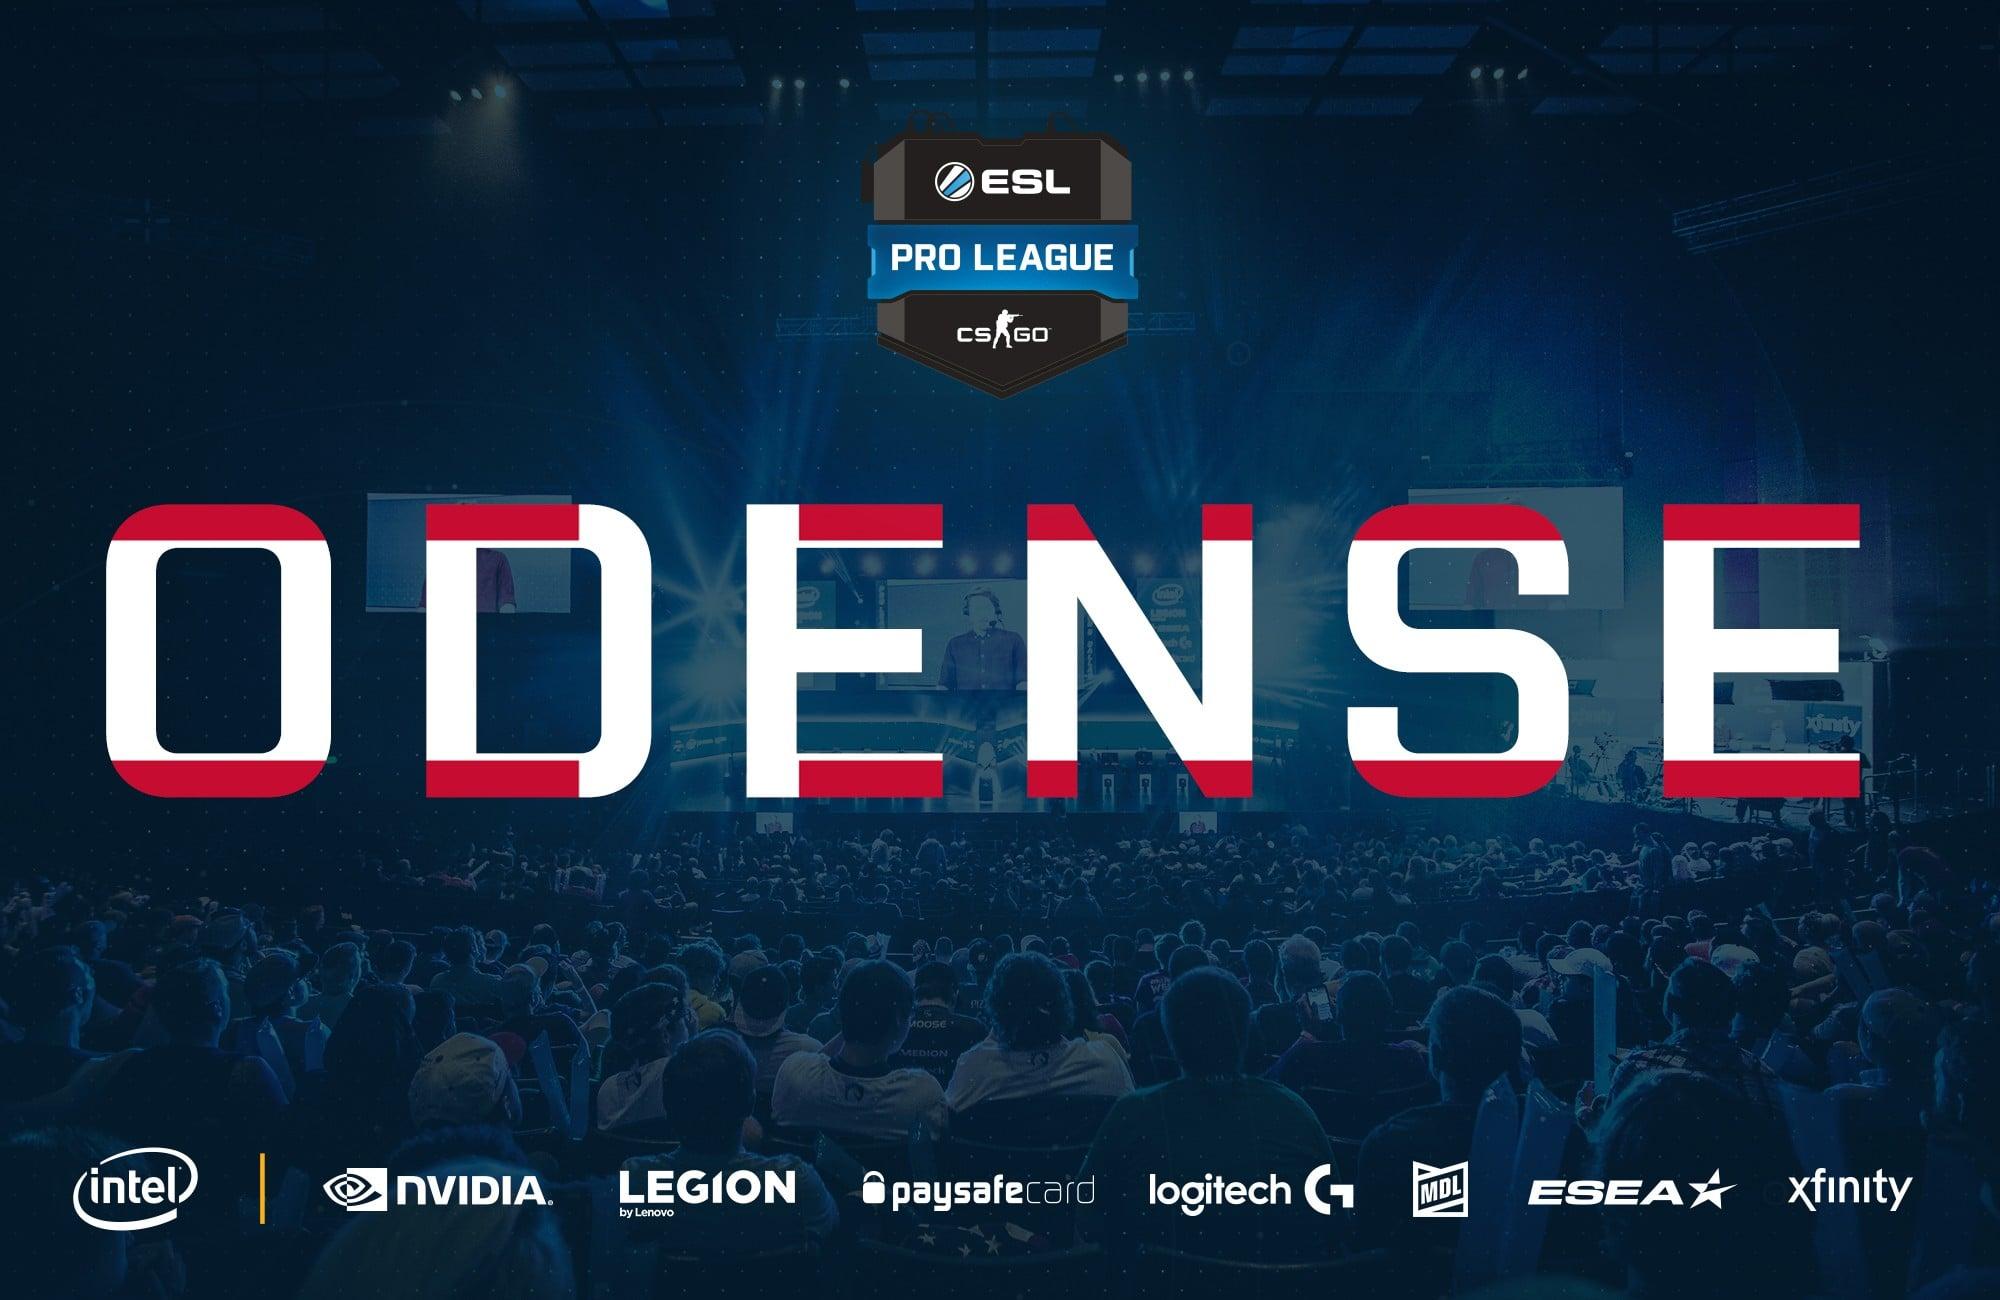 ESL Pro League Odsense